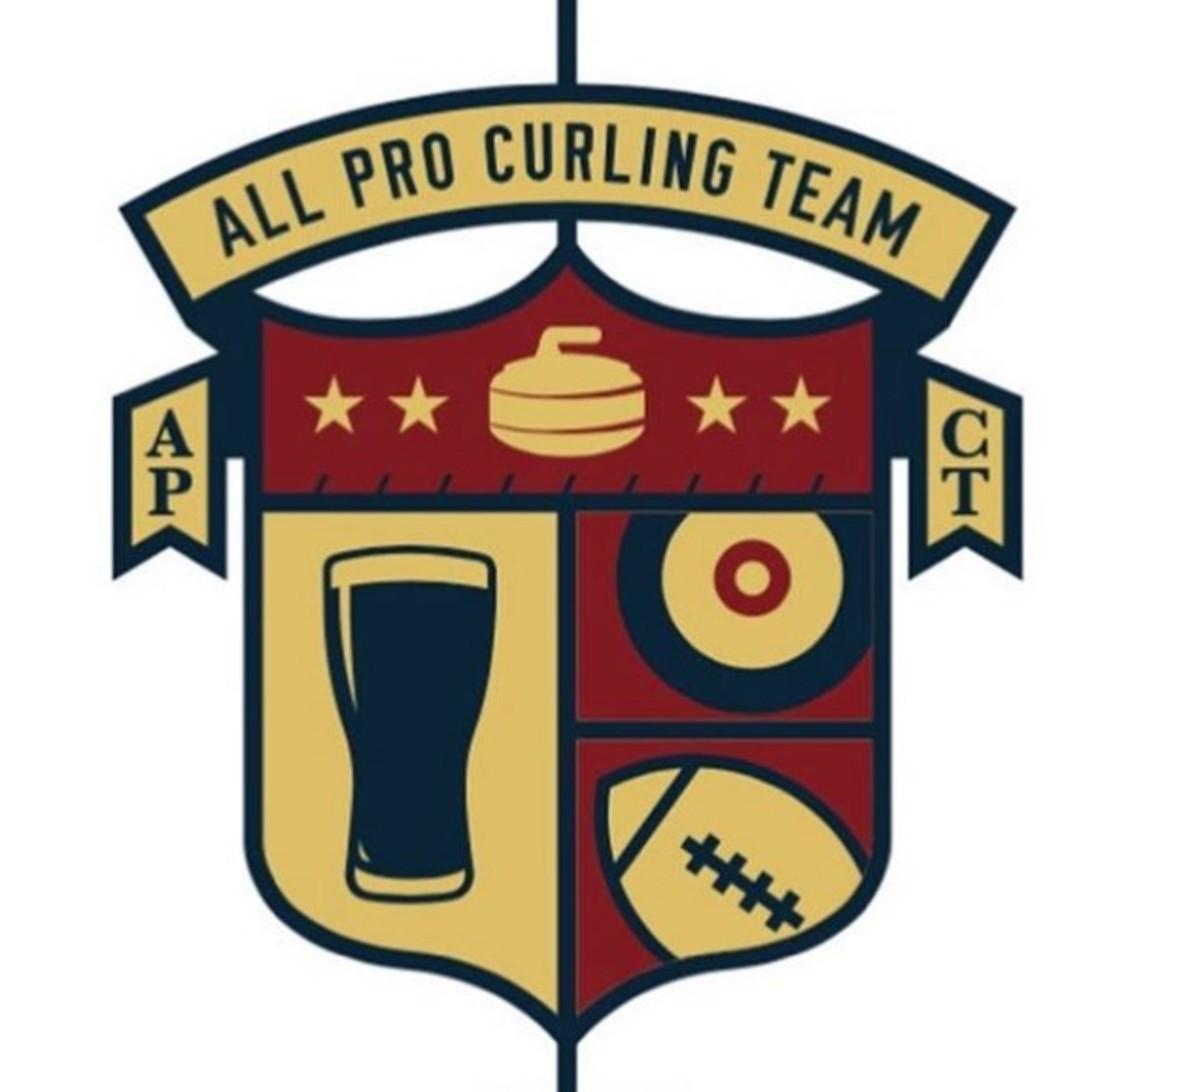 Jared allen clipart jpg royalty free download Ex-Viking Jared Allen to make pro curling debut against Team Shuster ... jpg royalty free download